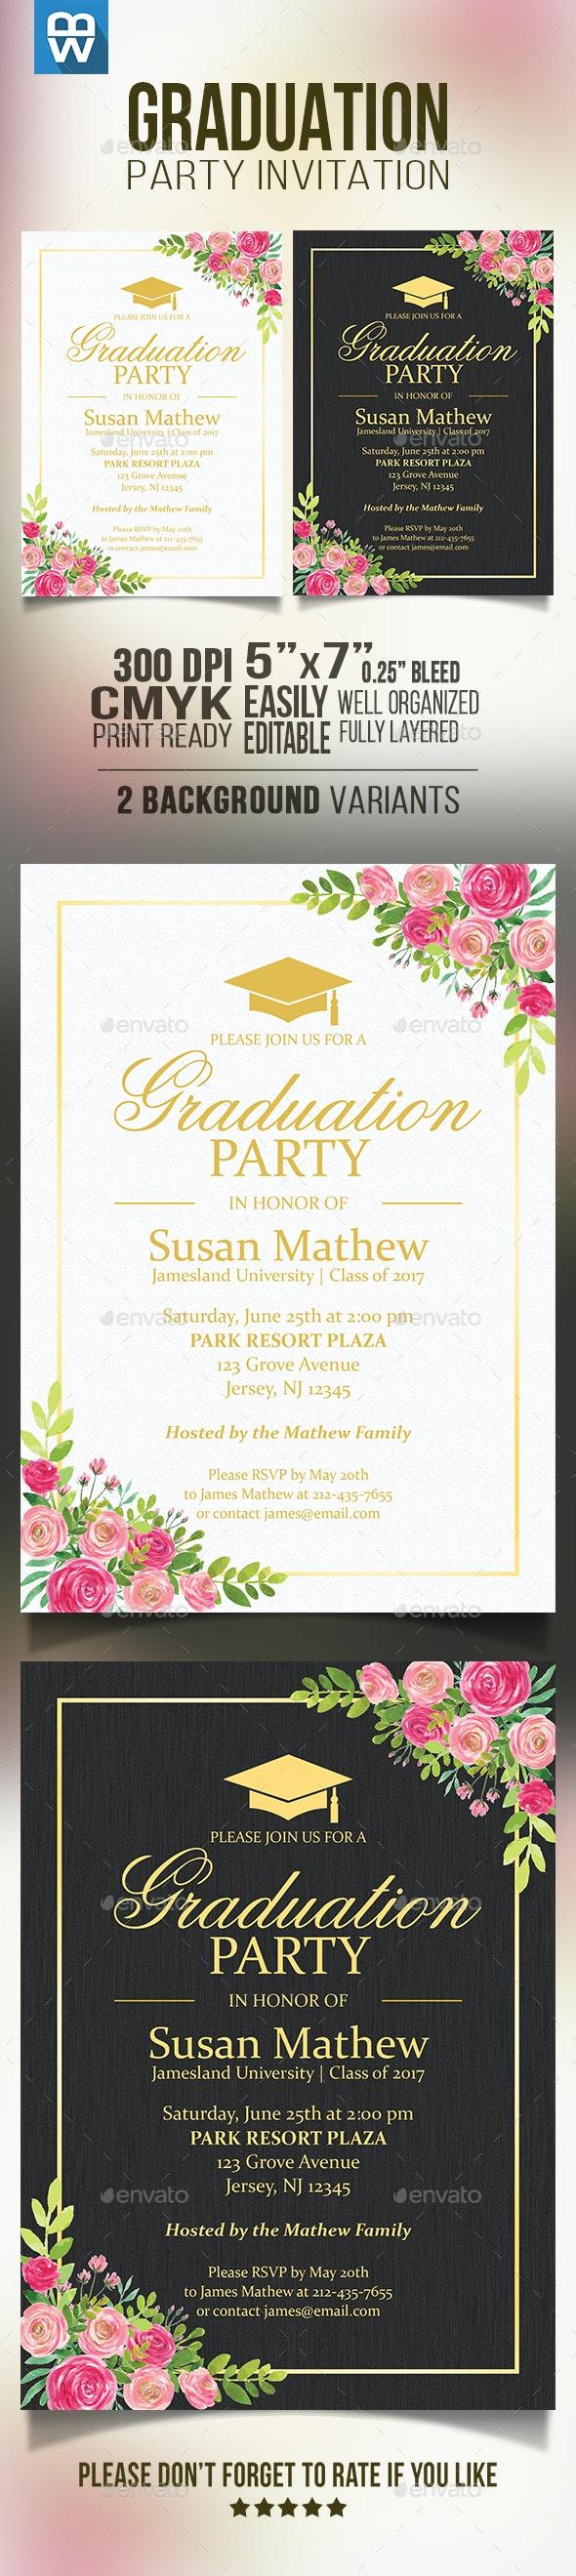 Floral Graduation Party Invitation - Cards & Invites Print Templates